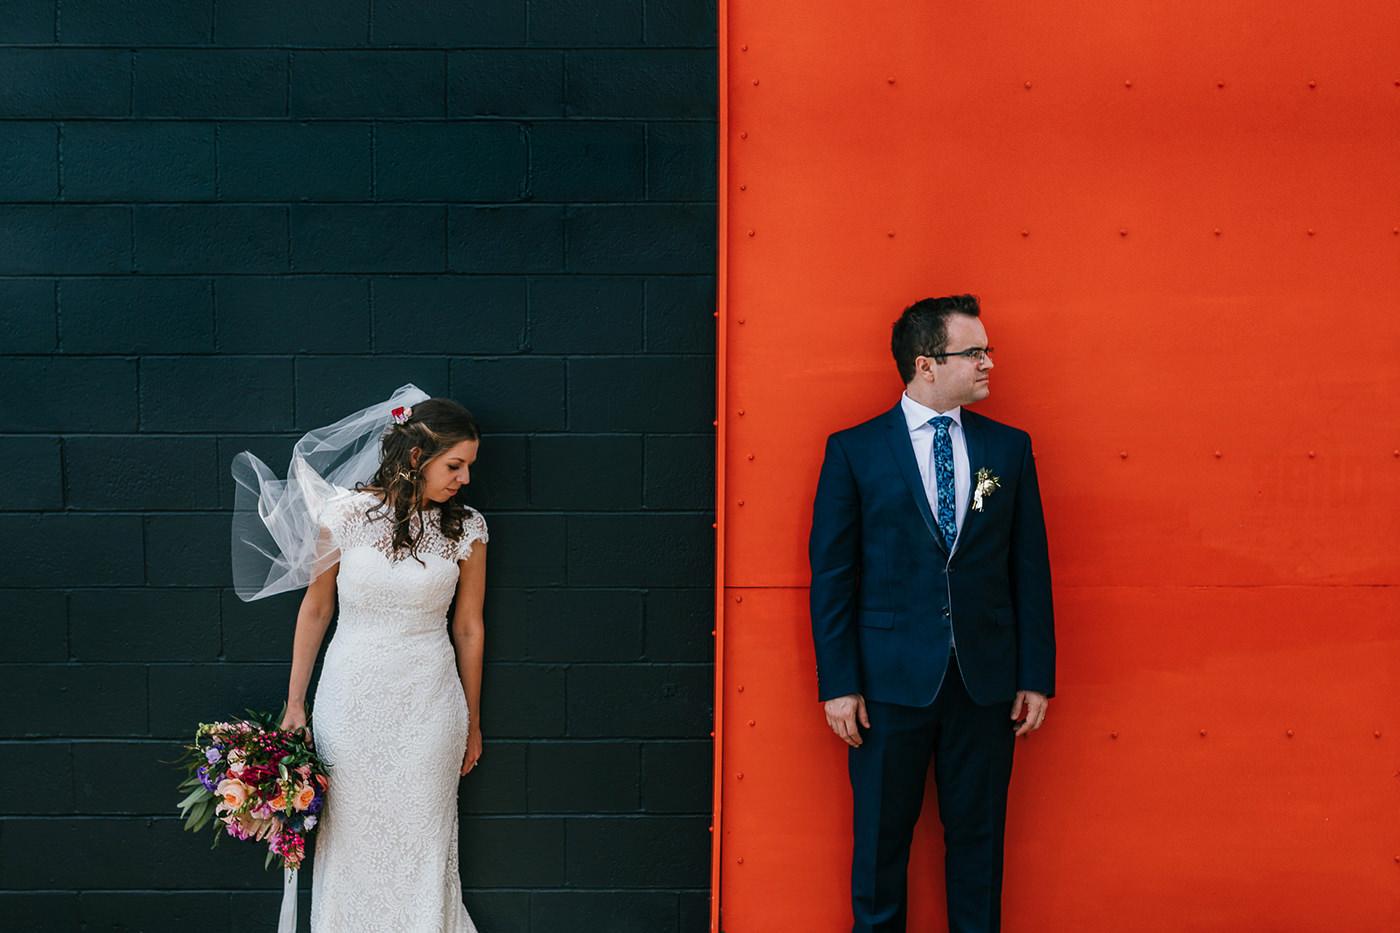 wedding_photographer_nz-00010.jpg